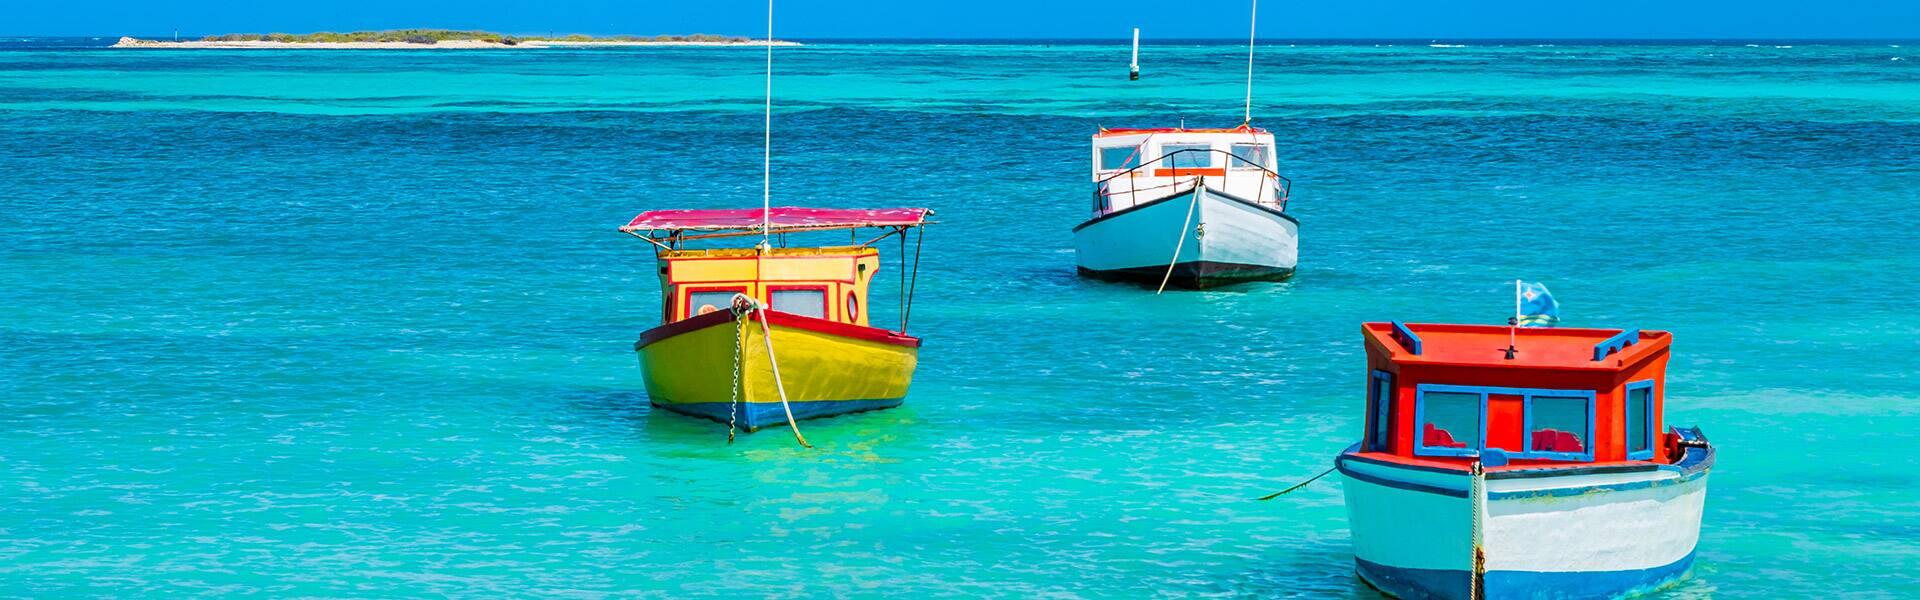 Panamakanal:Curaçao, Aruba und Cartagena